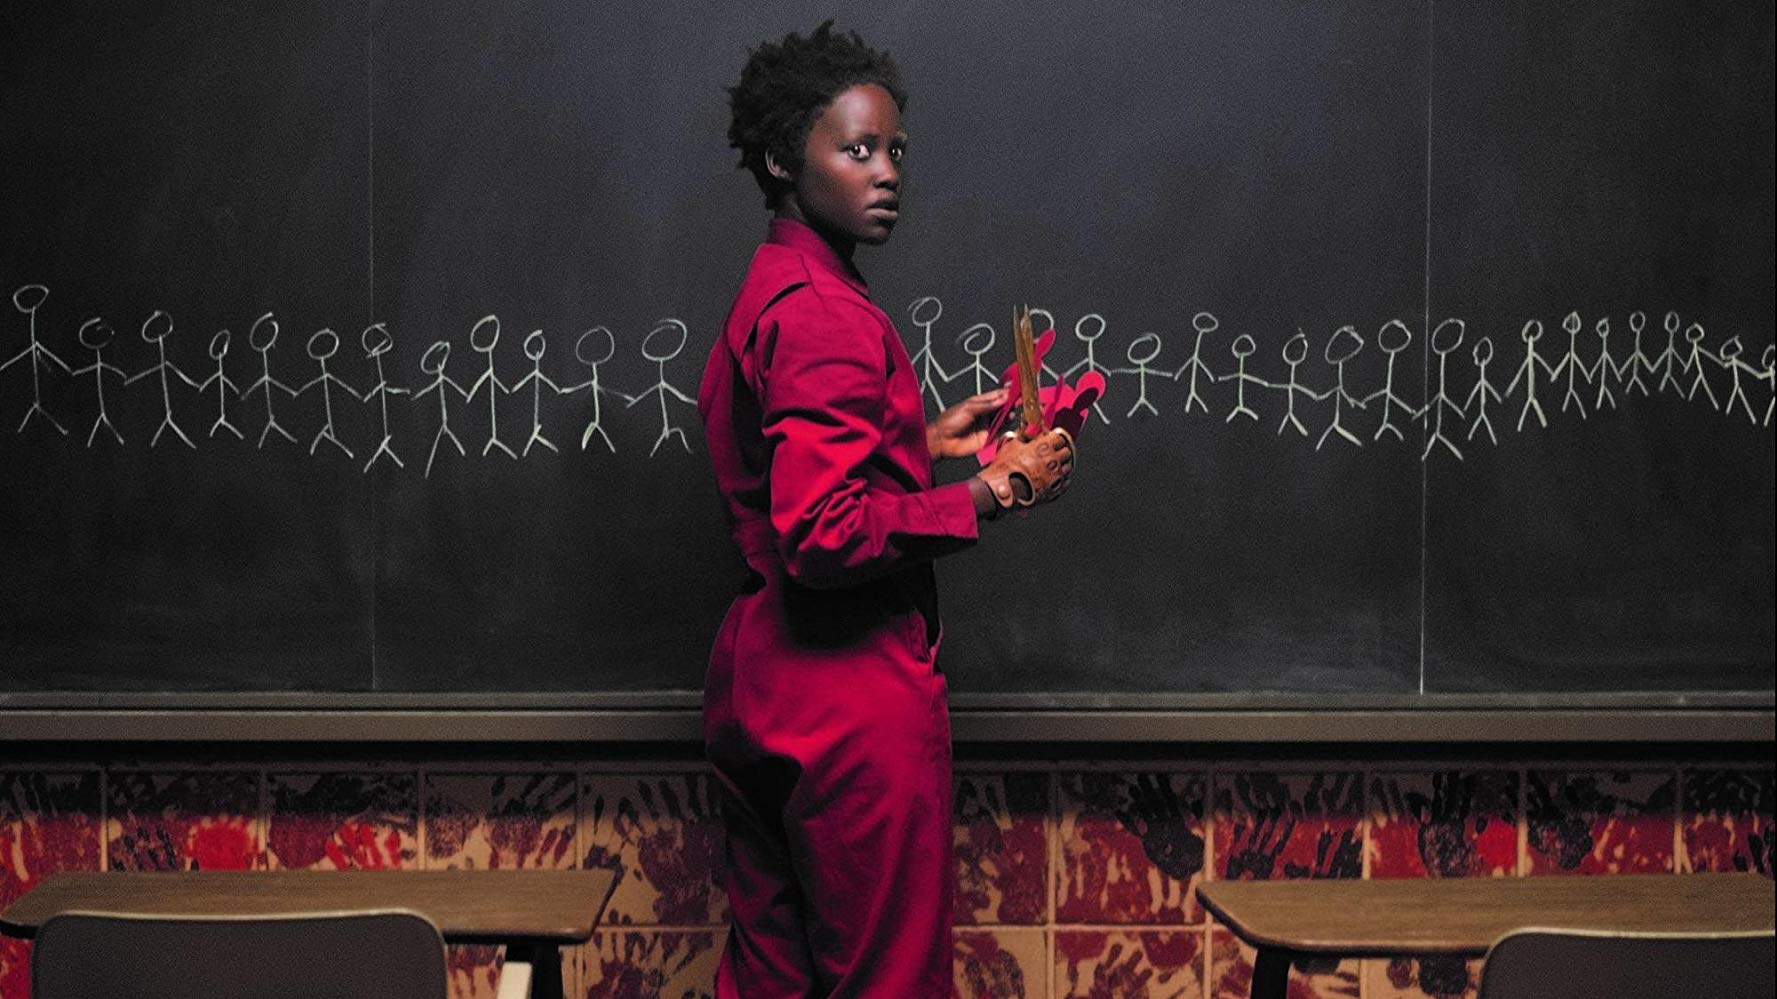 us-lupita-nyongo-hands